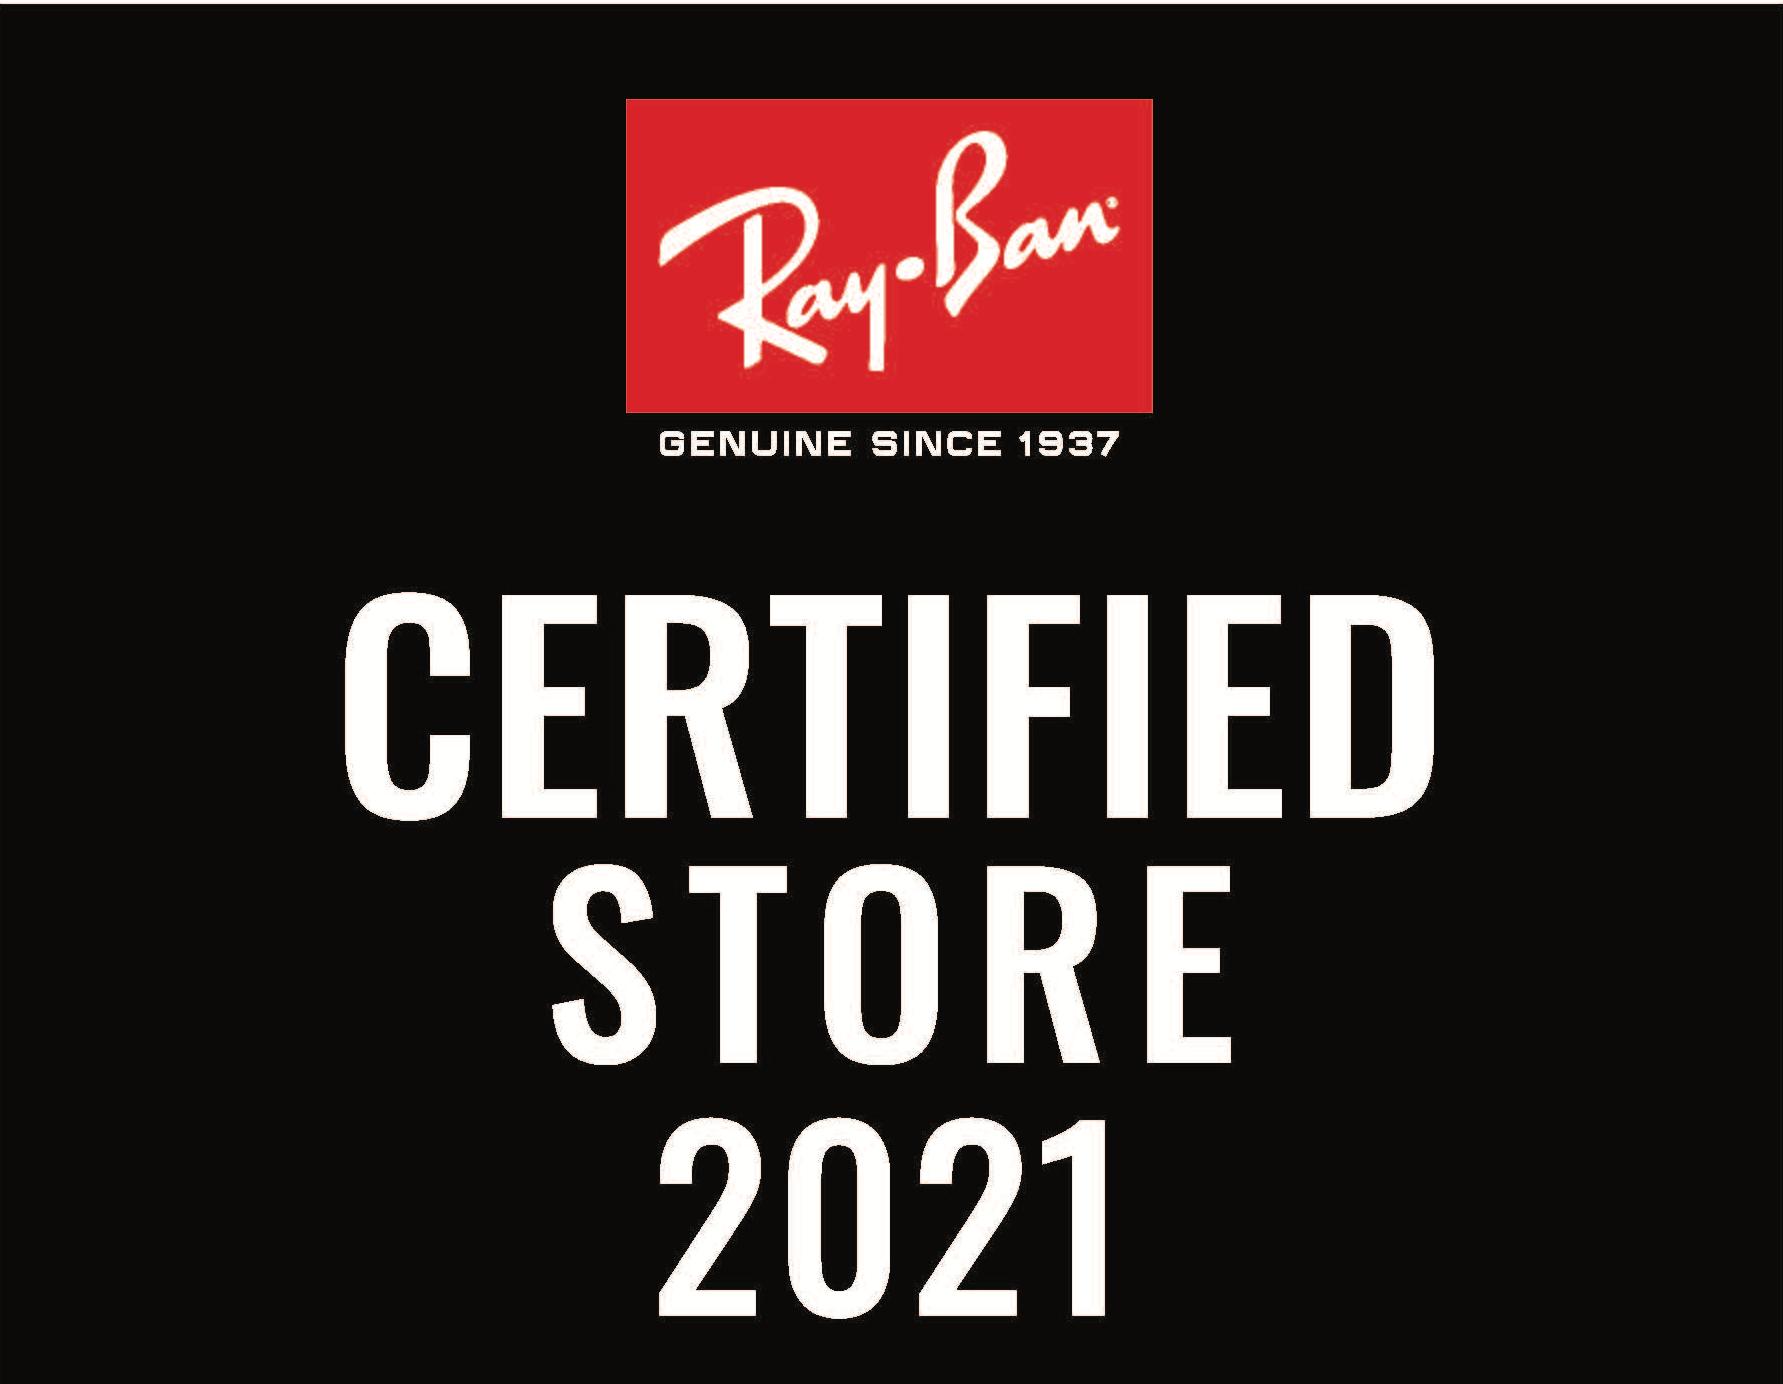 rayban tienda certificada